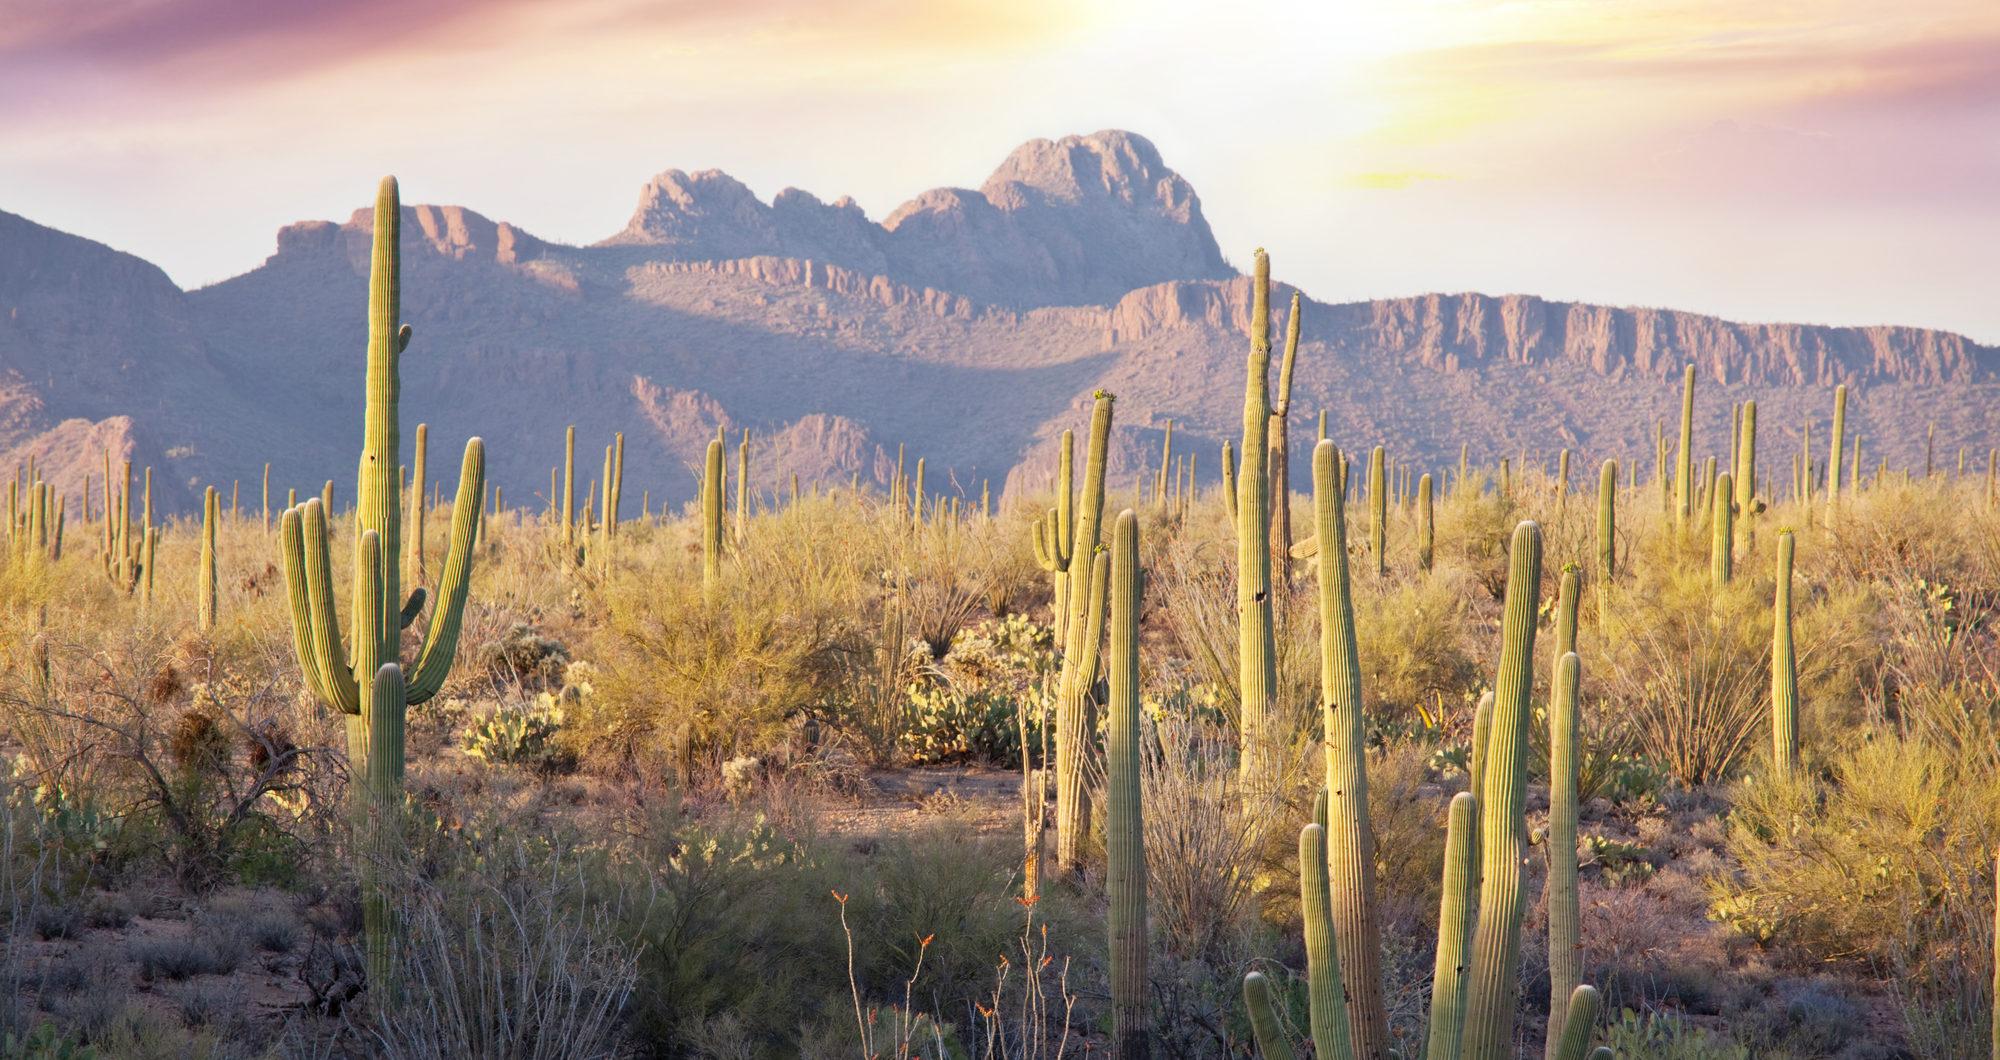 Saguaro Cactus Park